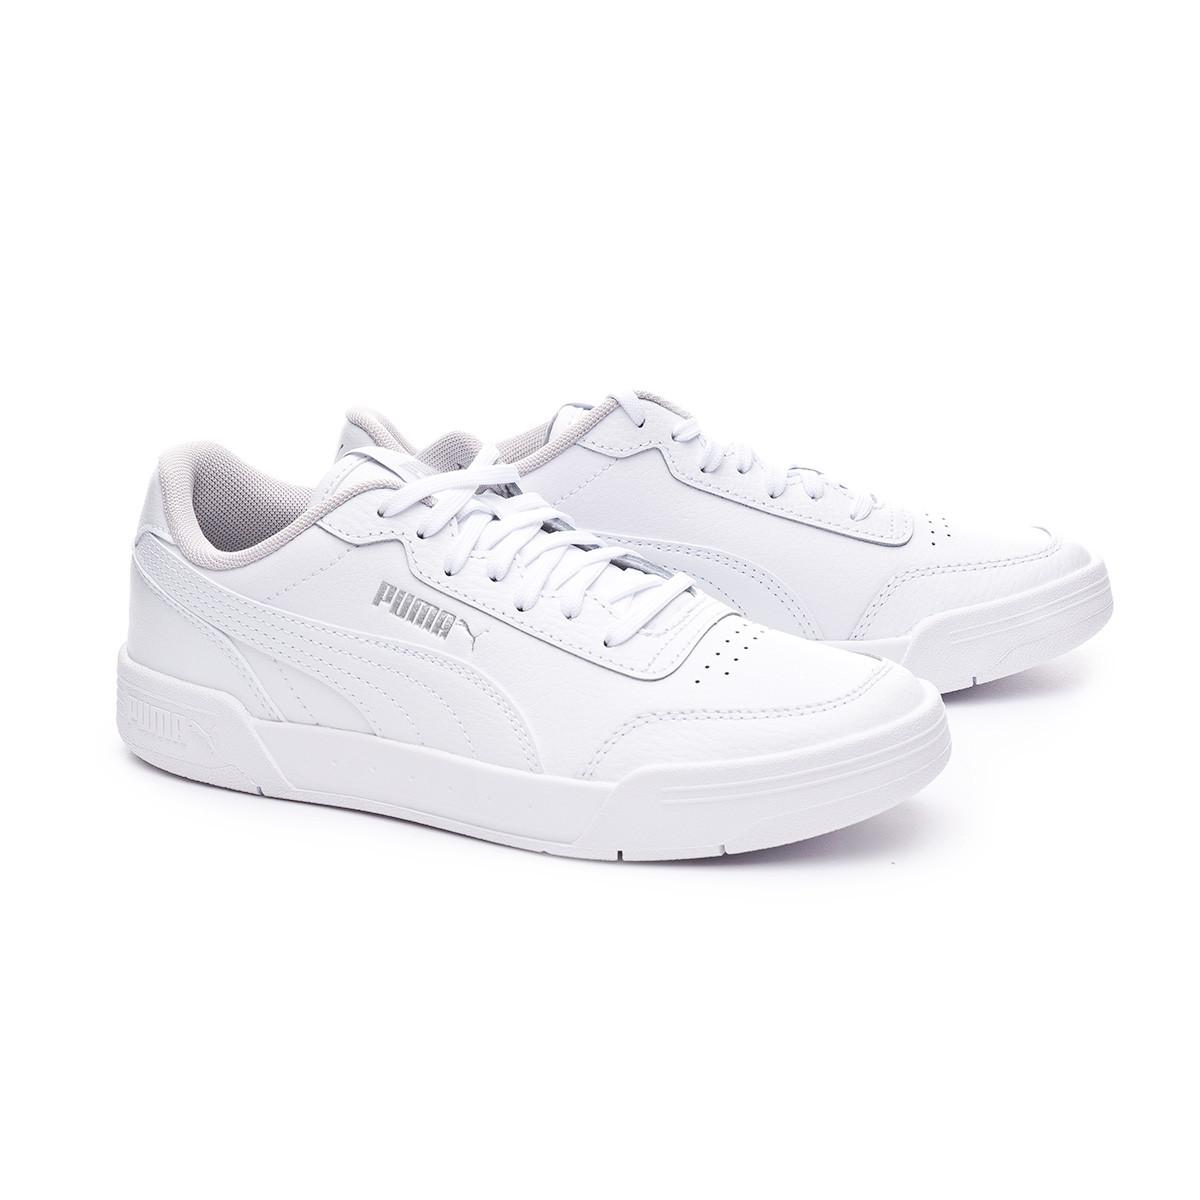 Scarpe Bambino Silver I2edhw9 White Puma Caracal VpUSzM